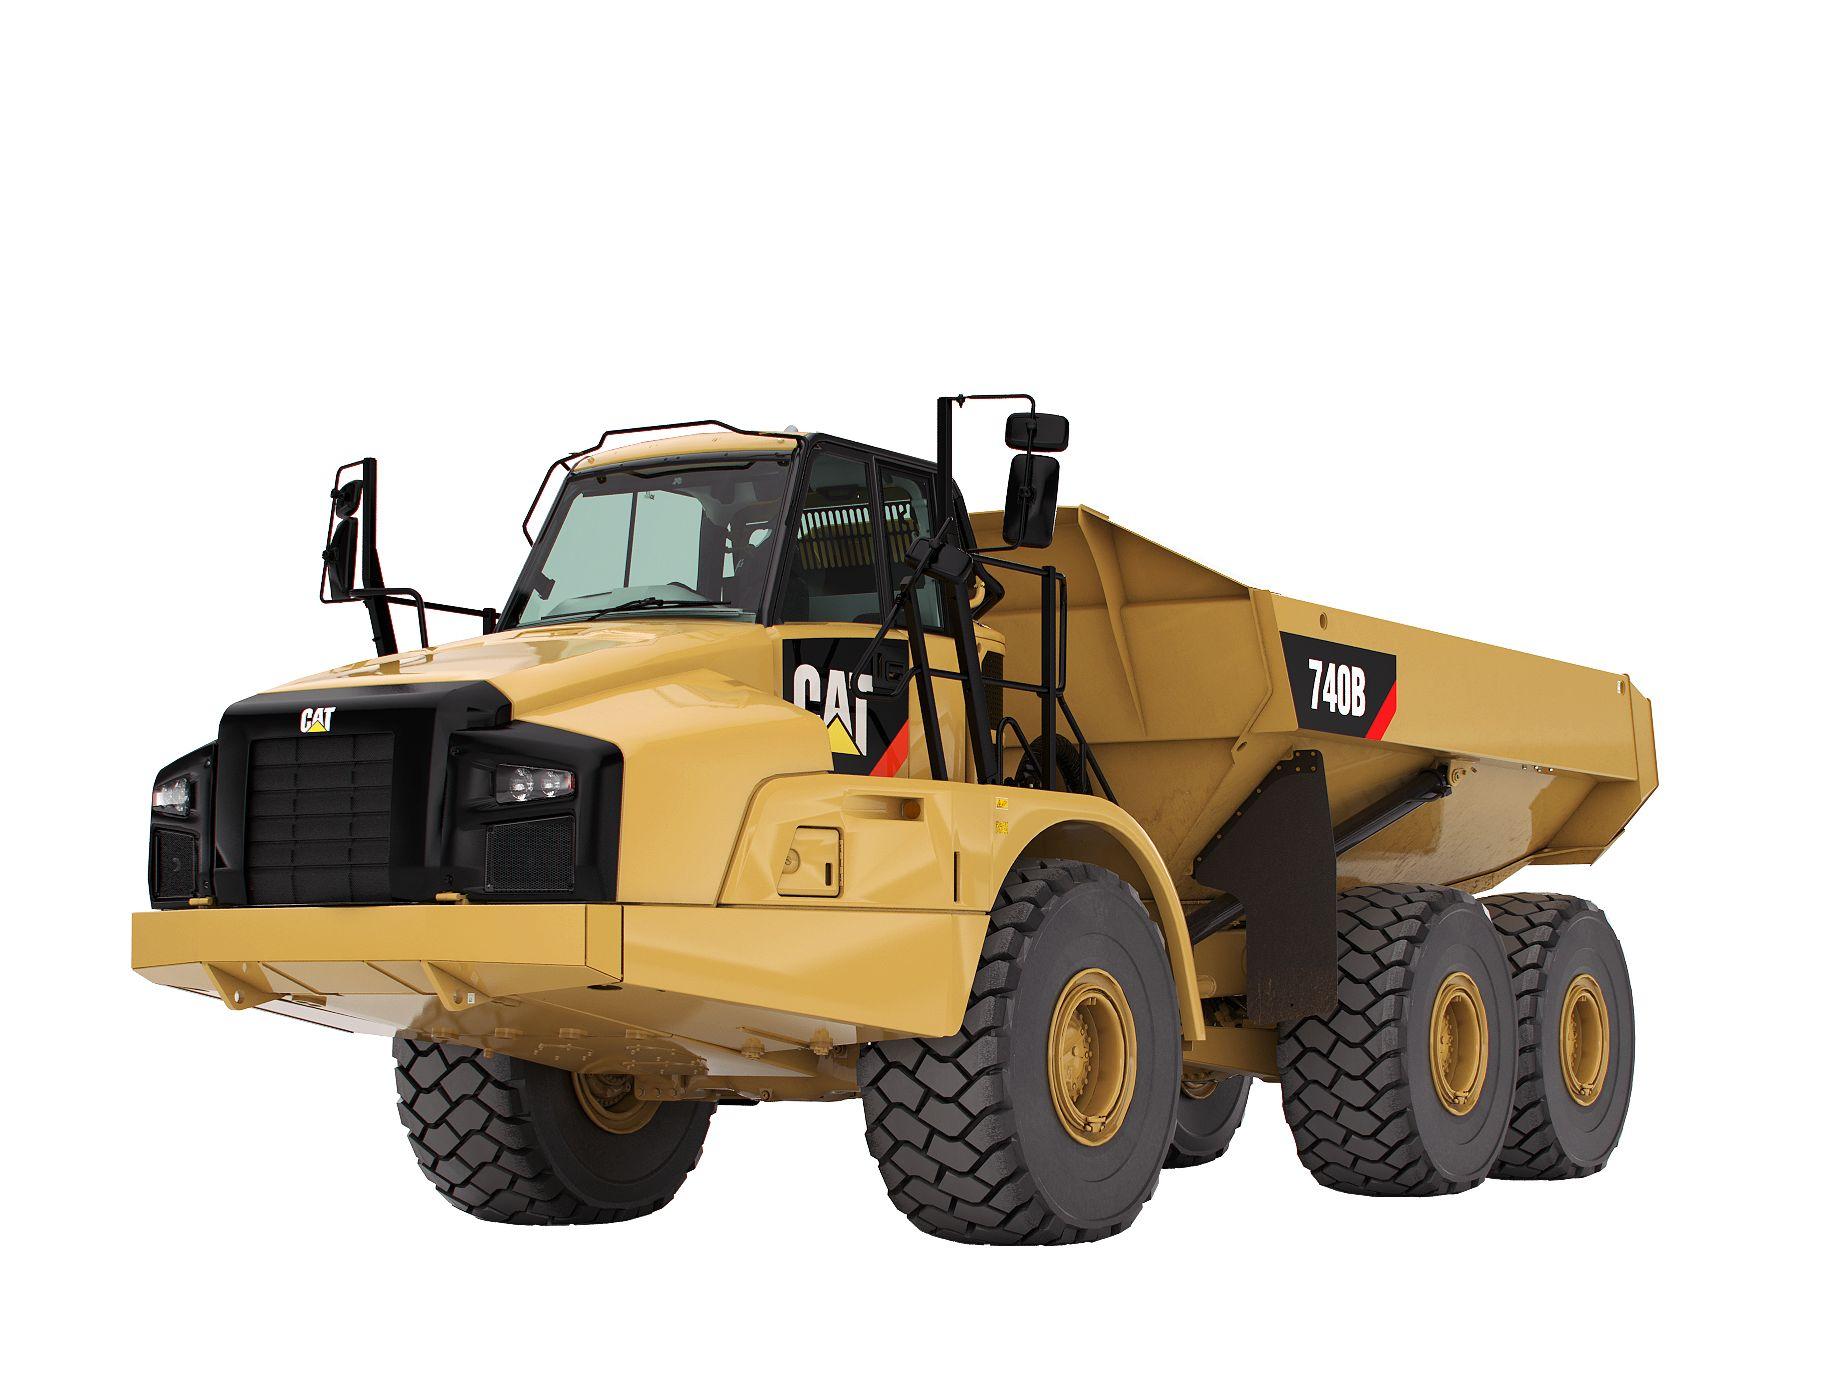 camiones-articulados